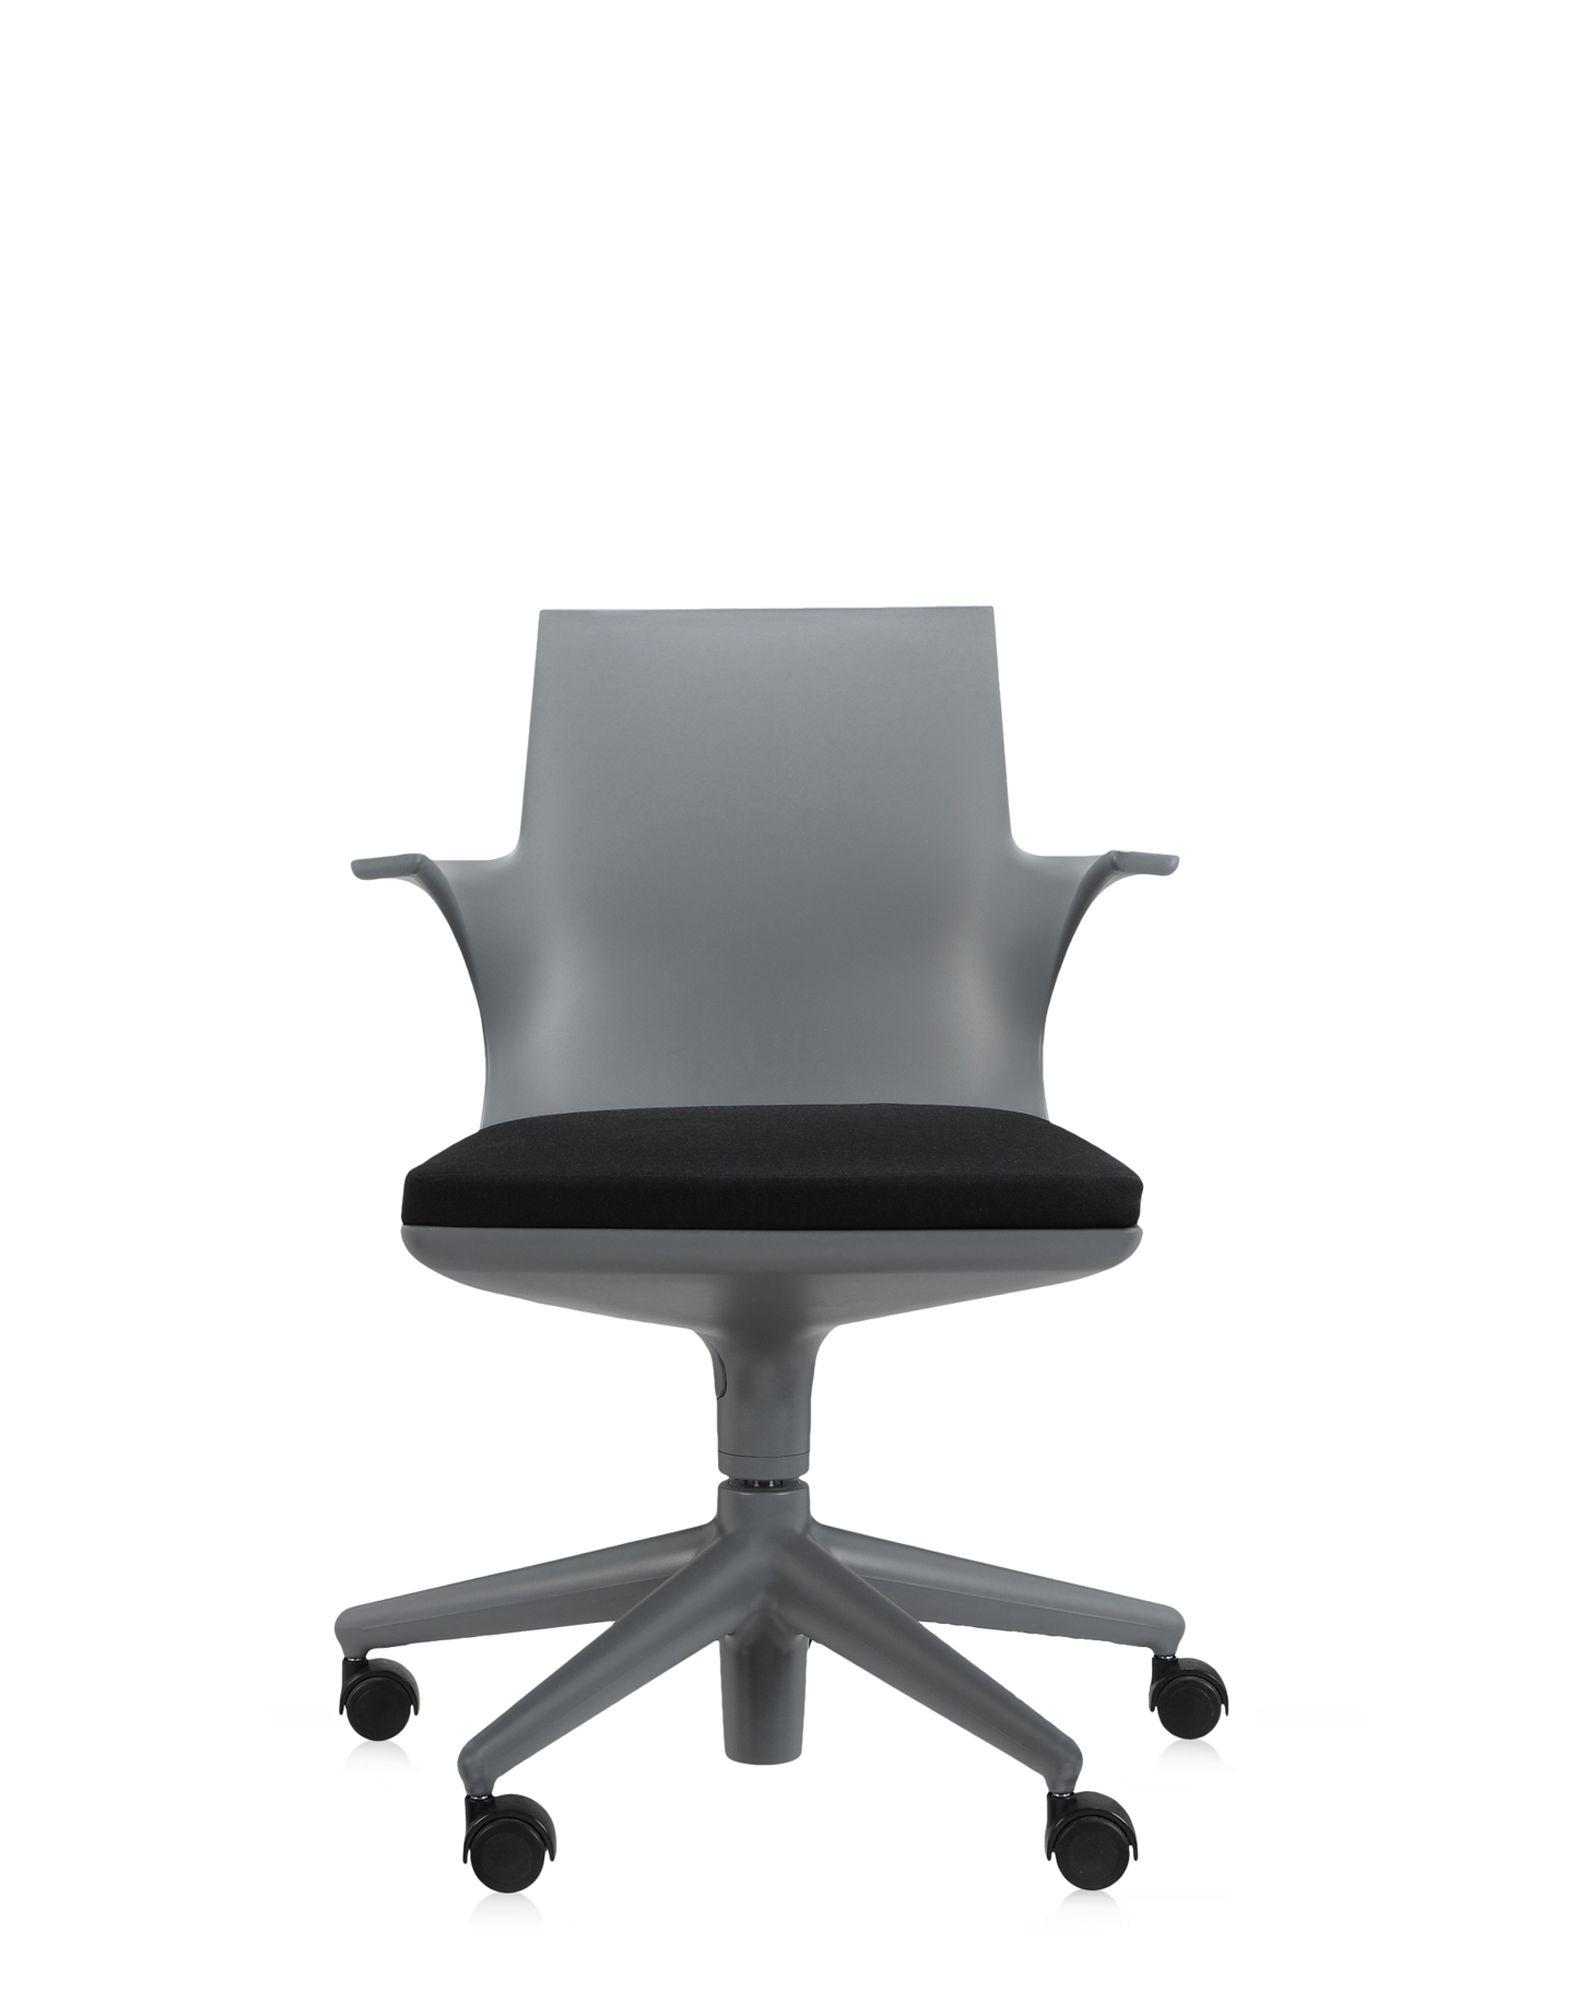 Kartell Sedia Ufficio Spoon Chair Grigio Nero Sedie